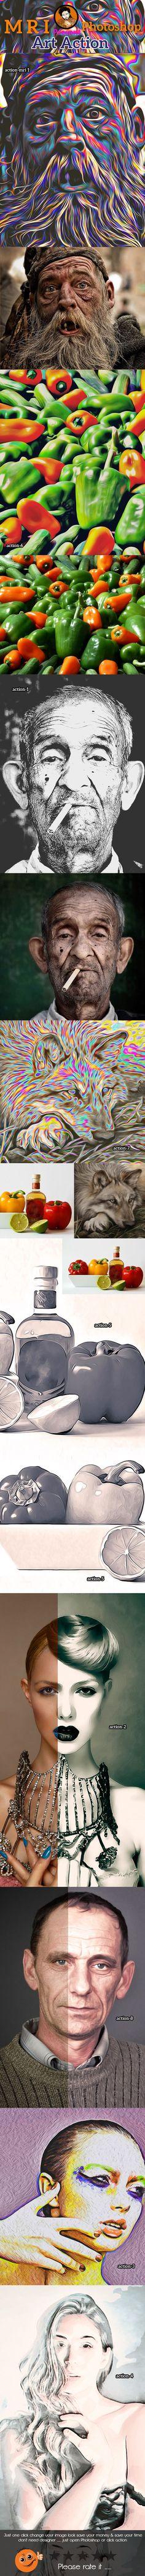 Oil Art Action  — Photoshop Action #HDR Action #mri art • Download ➝ https://graphicriver.net/item/oil-art-action/9693907?ref=pxcr